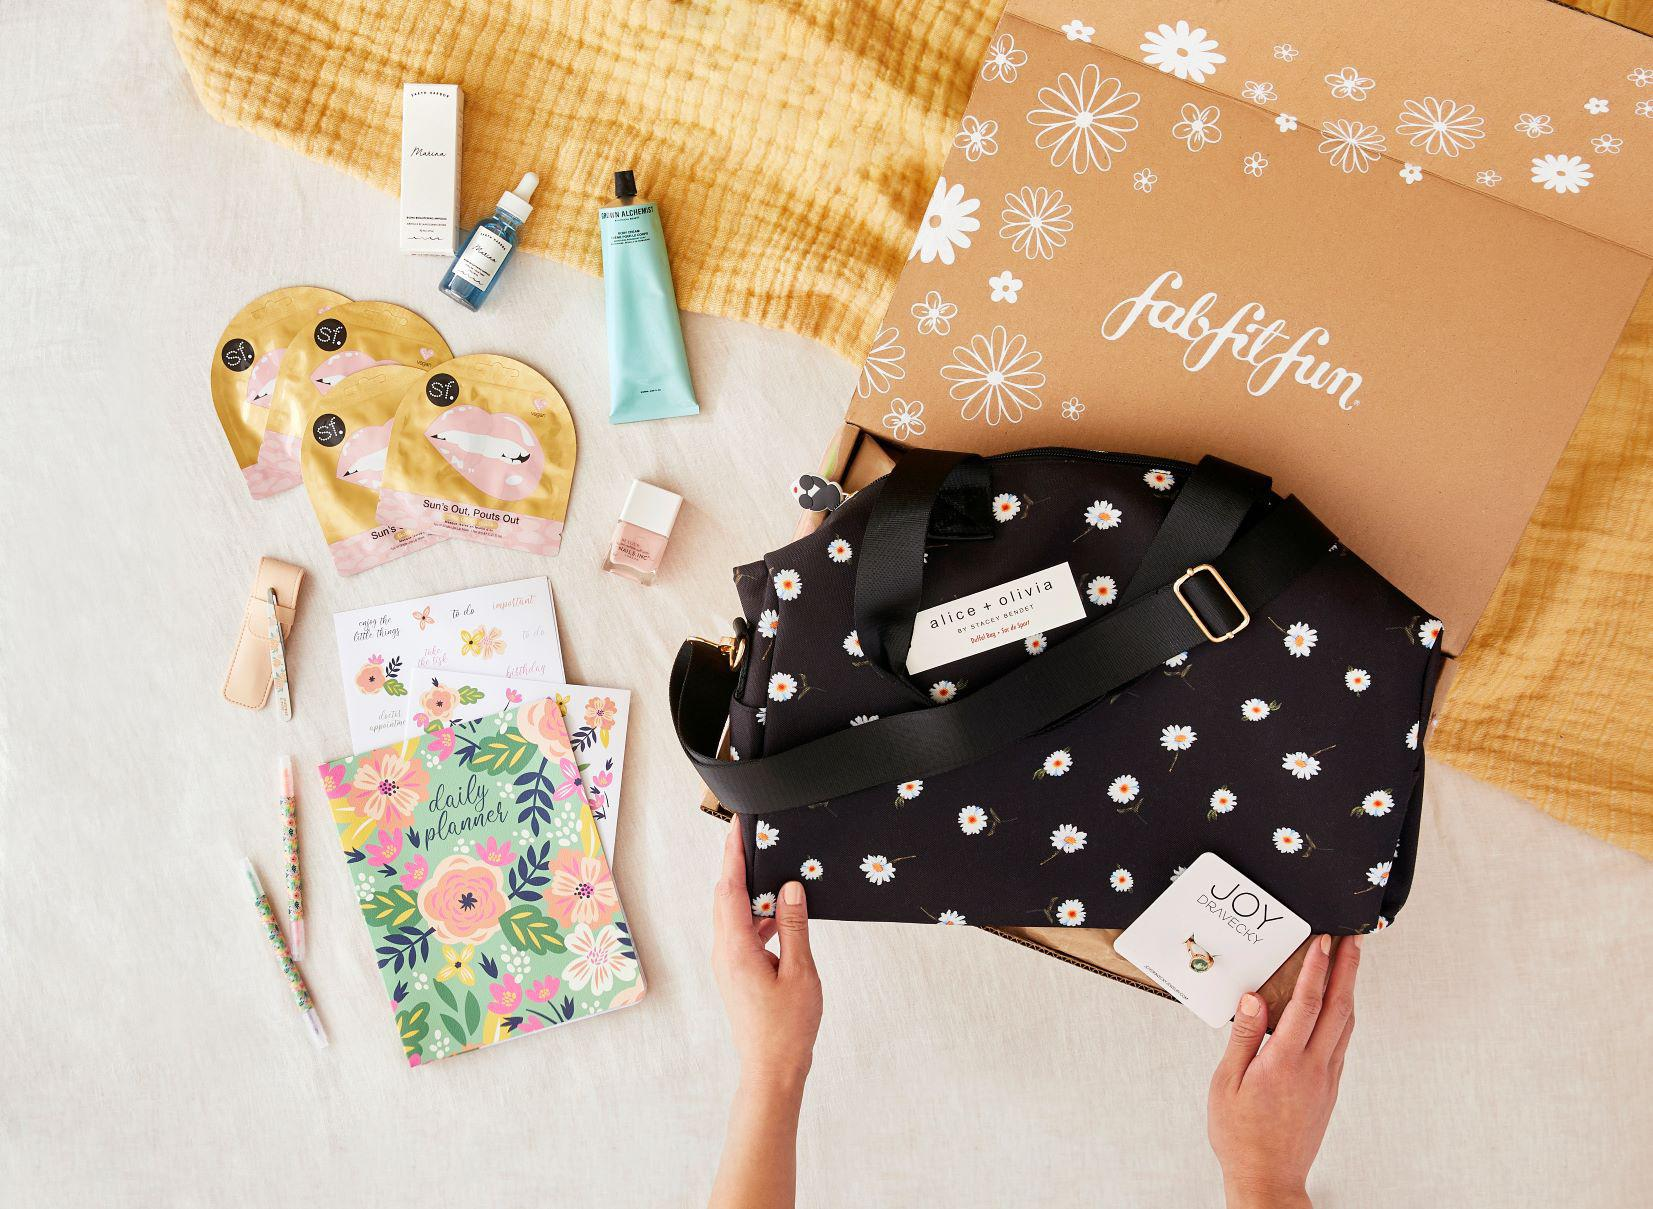 FabFitFun seasonal box